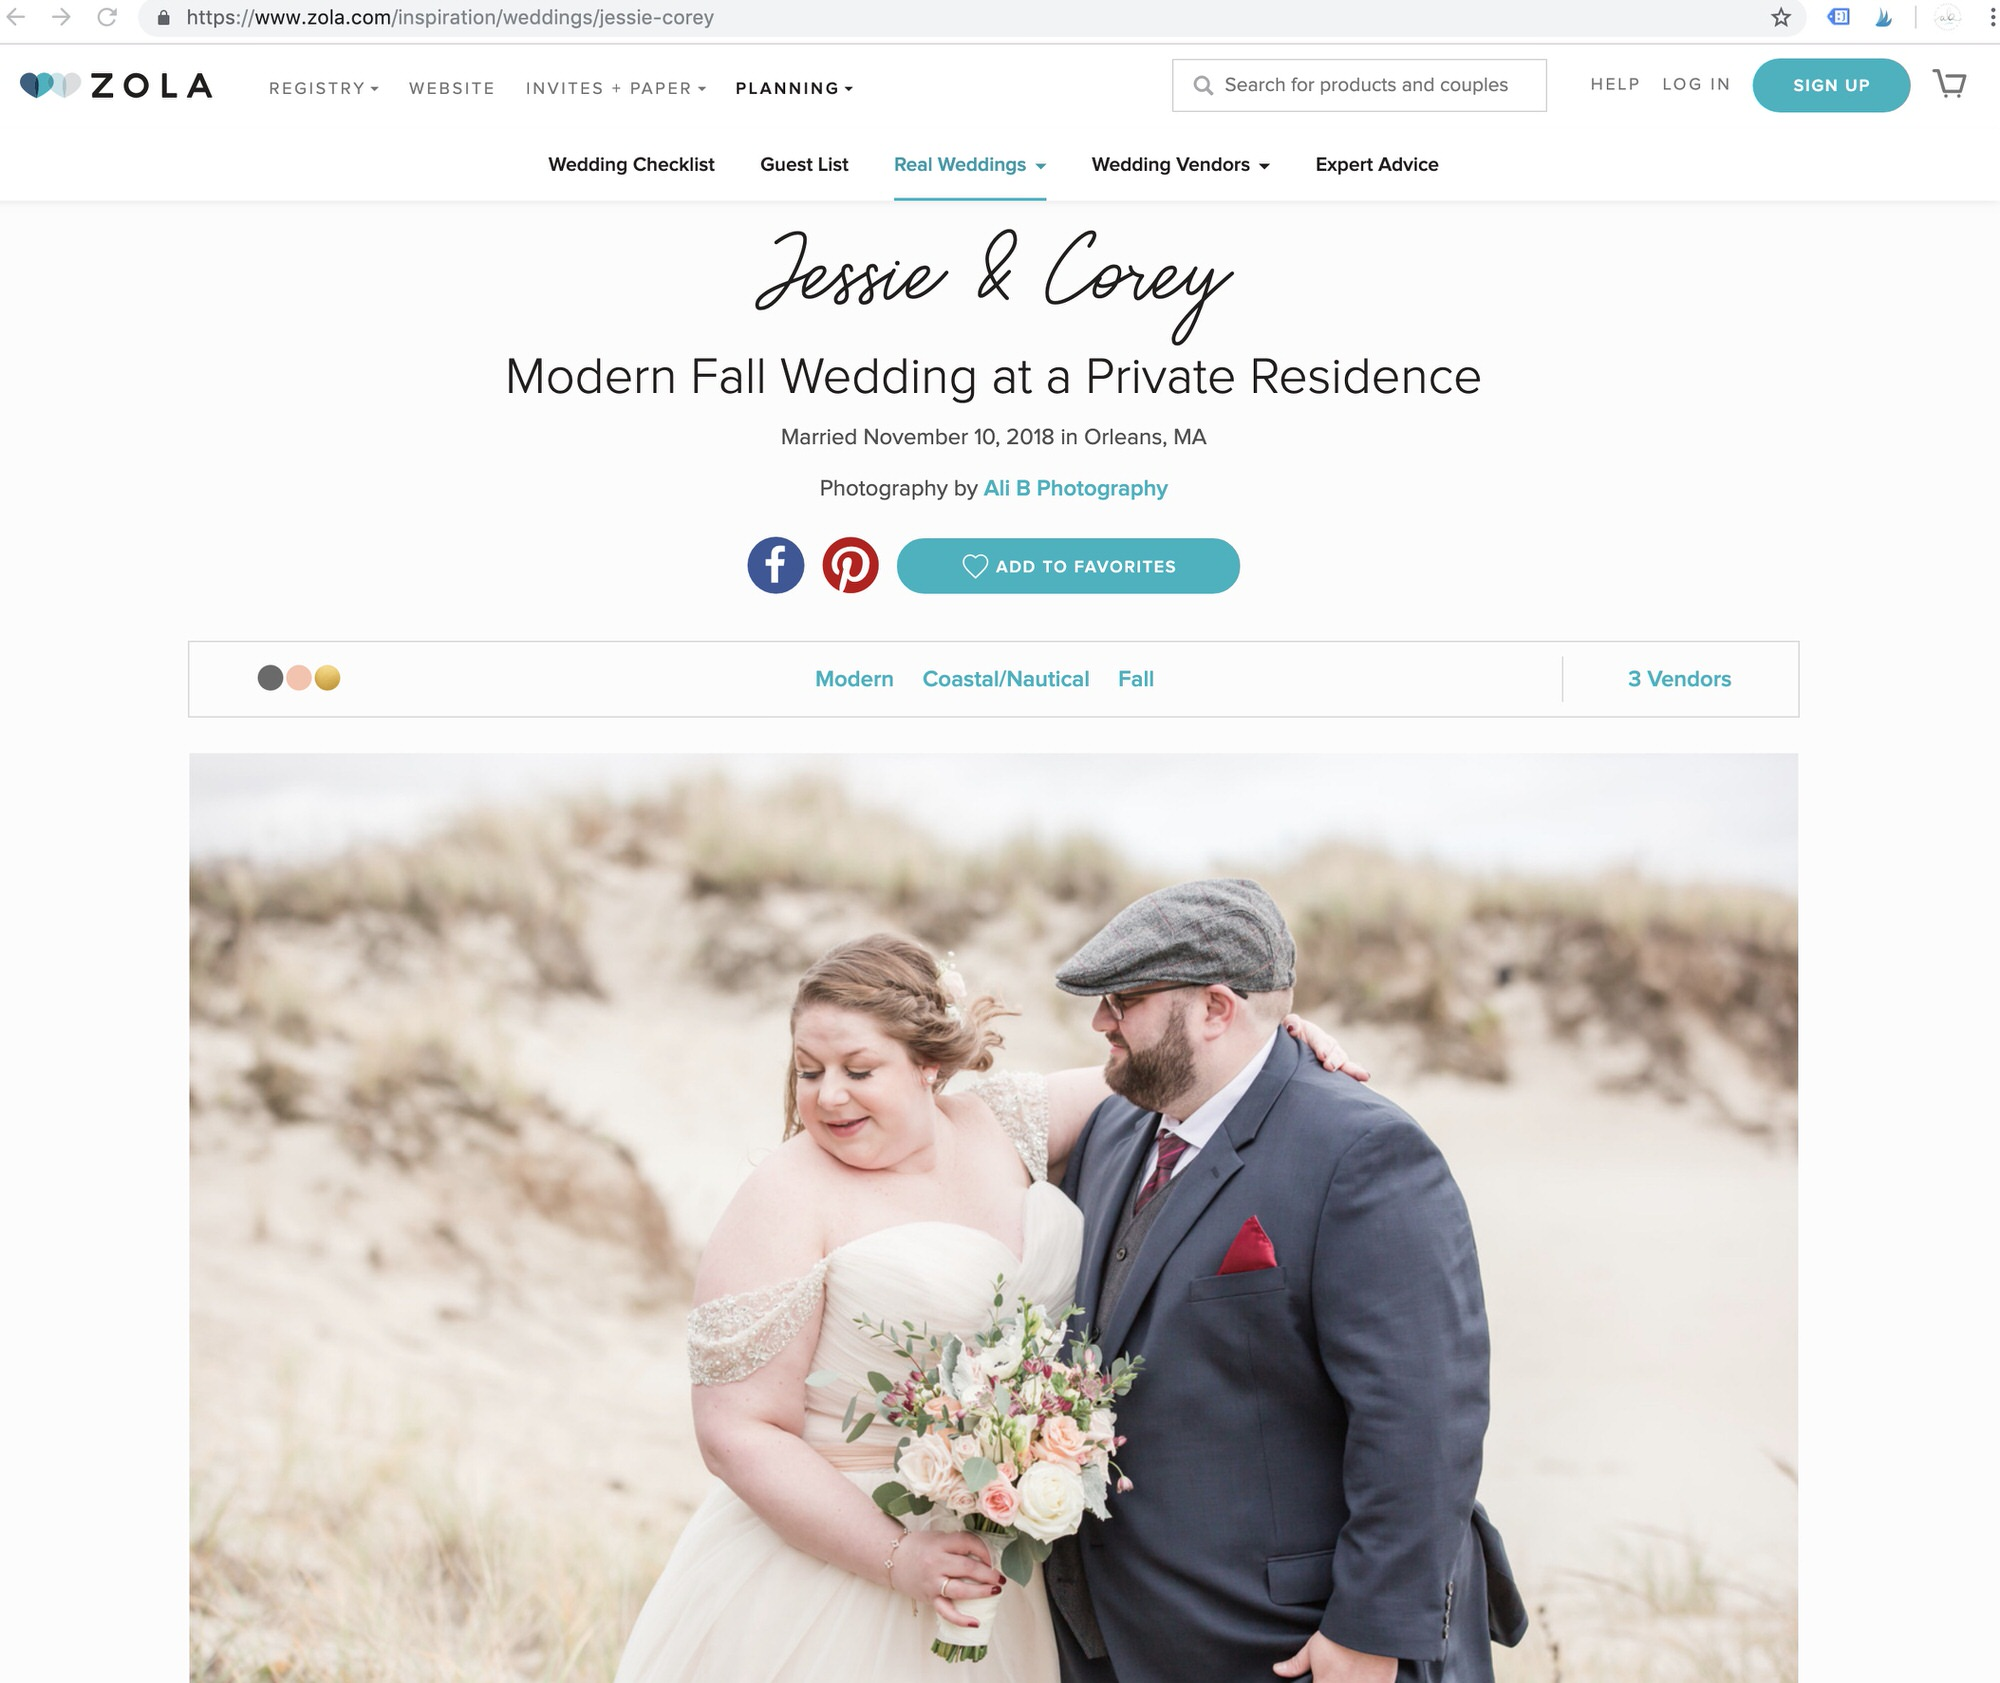 FEATURED | THE BOSTON BRIDE, BIG DAY MADE, WEDDING BOSTON + ZOLA